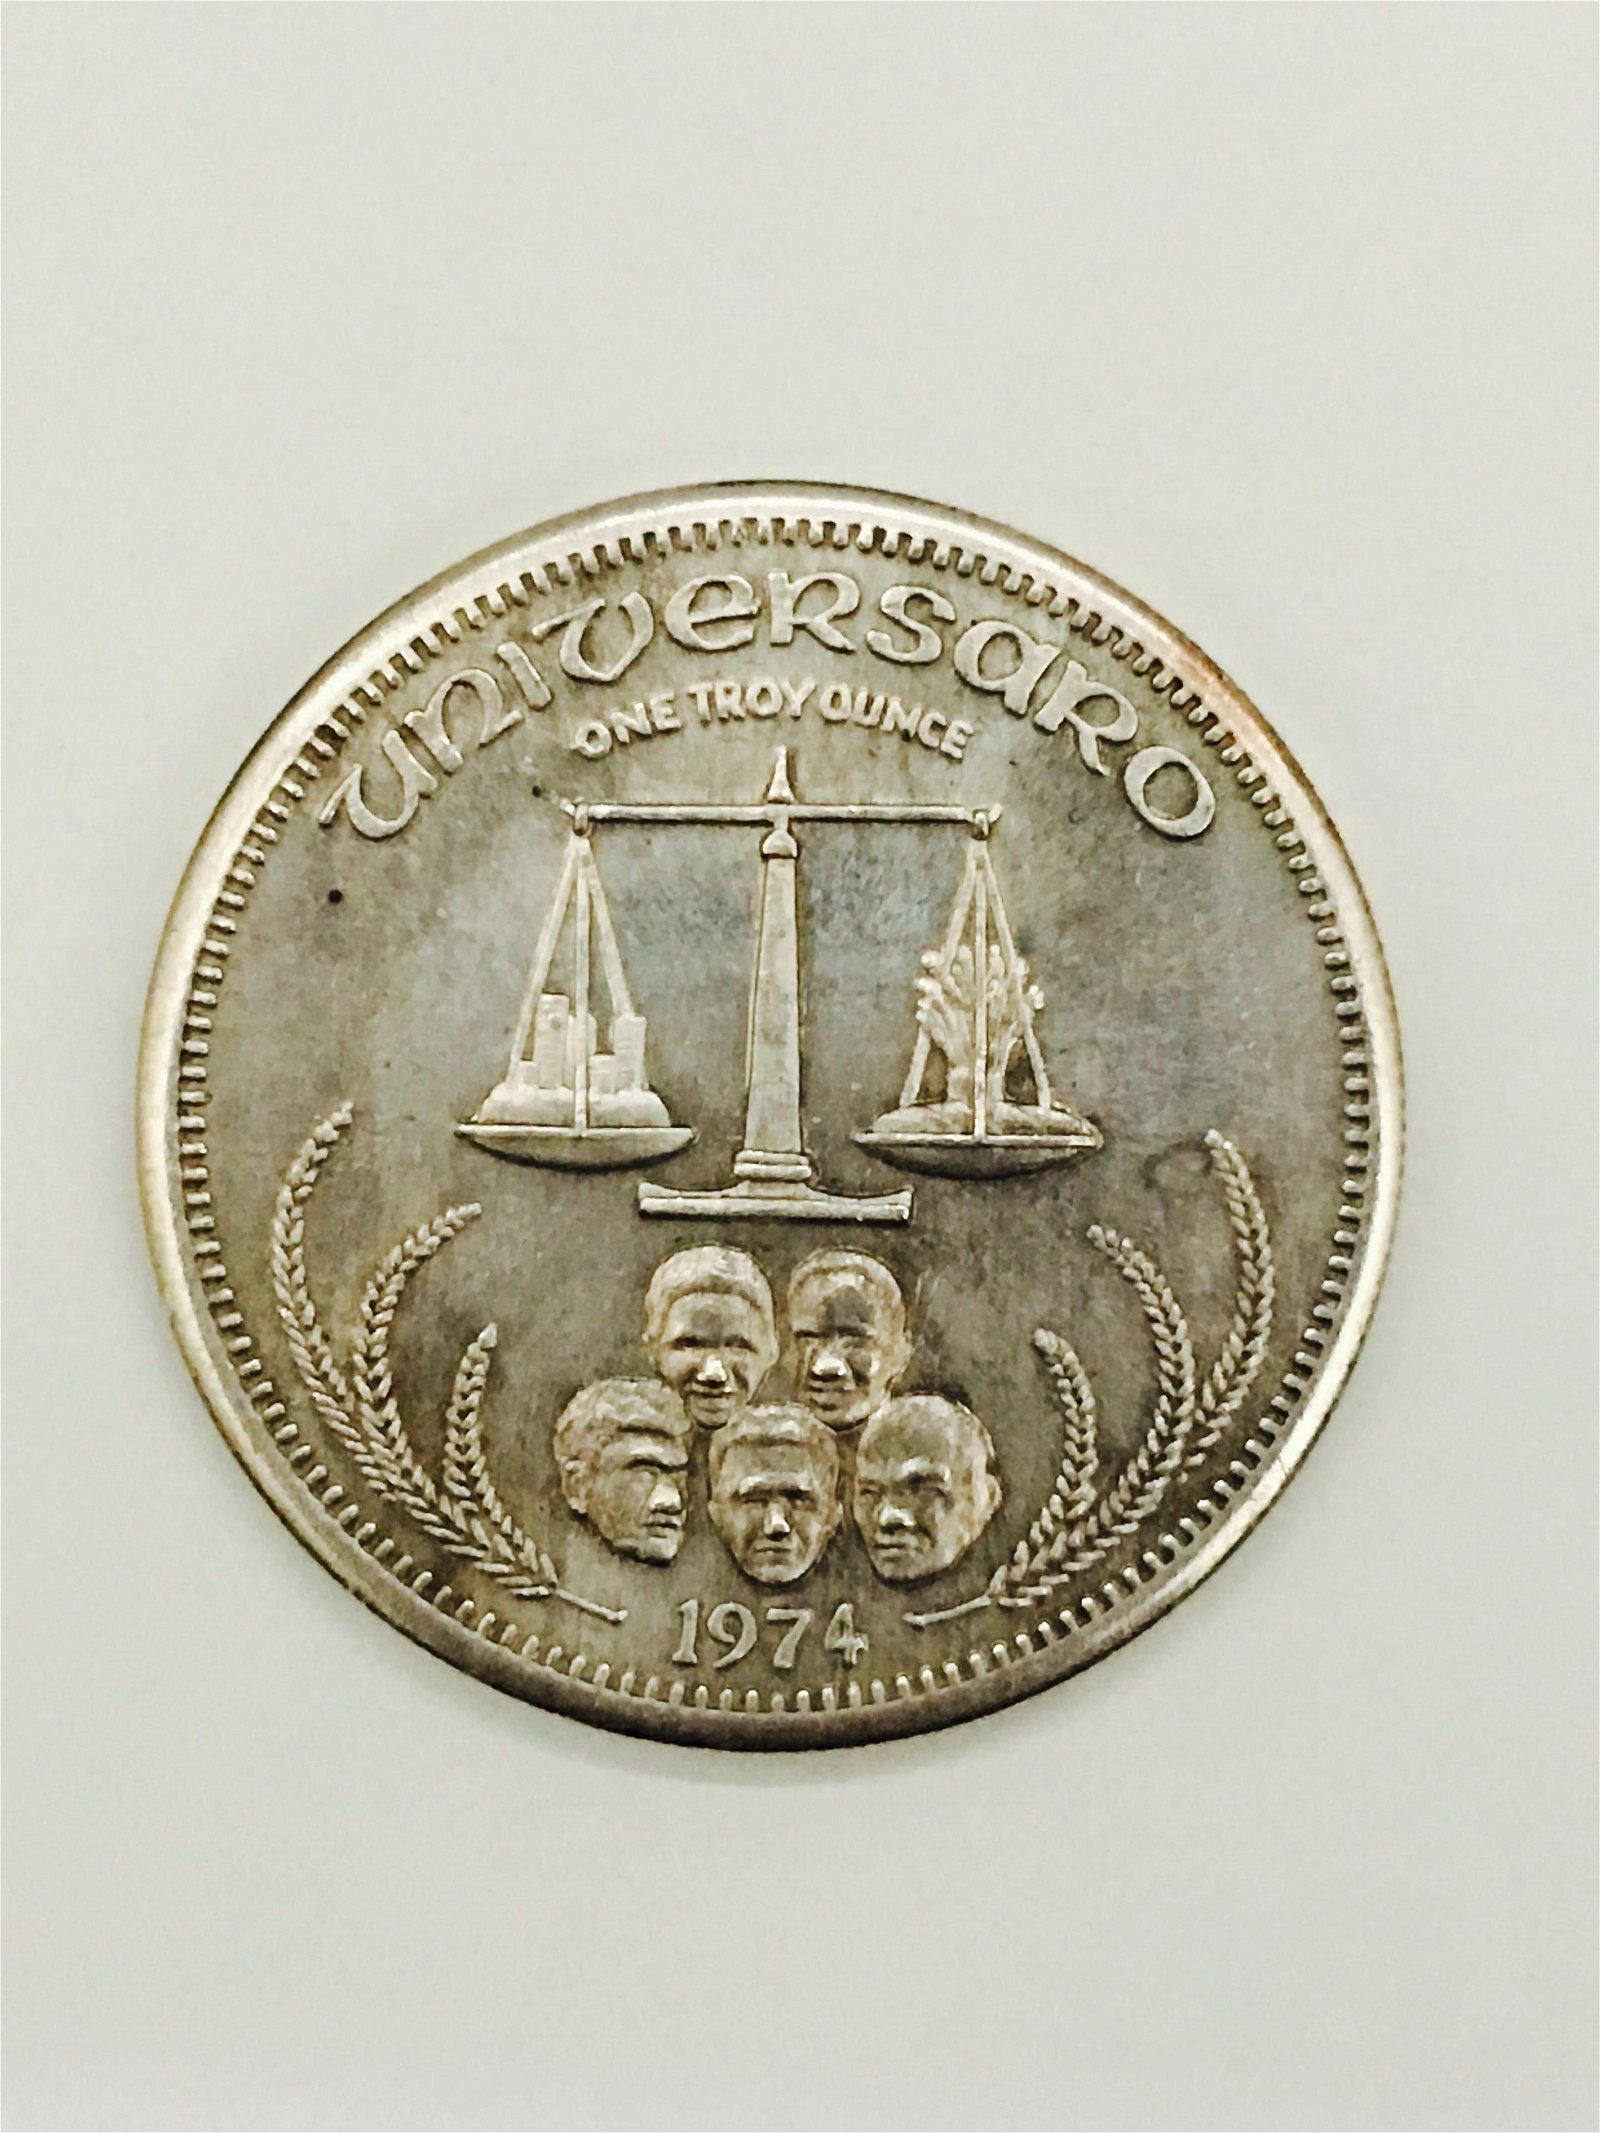 1974 Universaro Sterling Silver Coin. 1 Ounce.